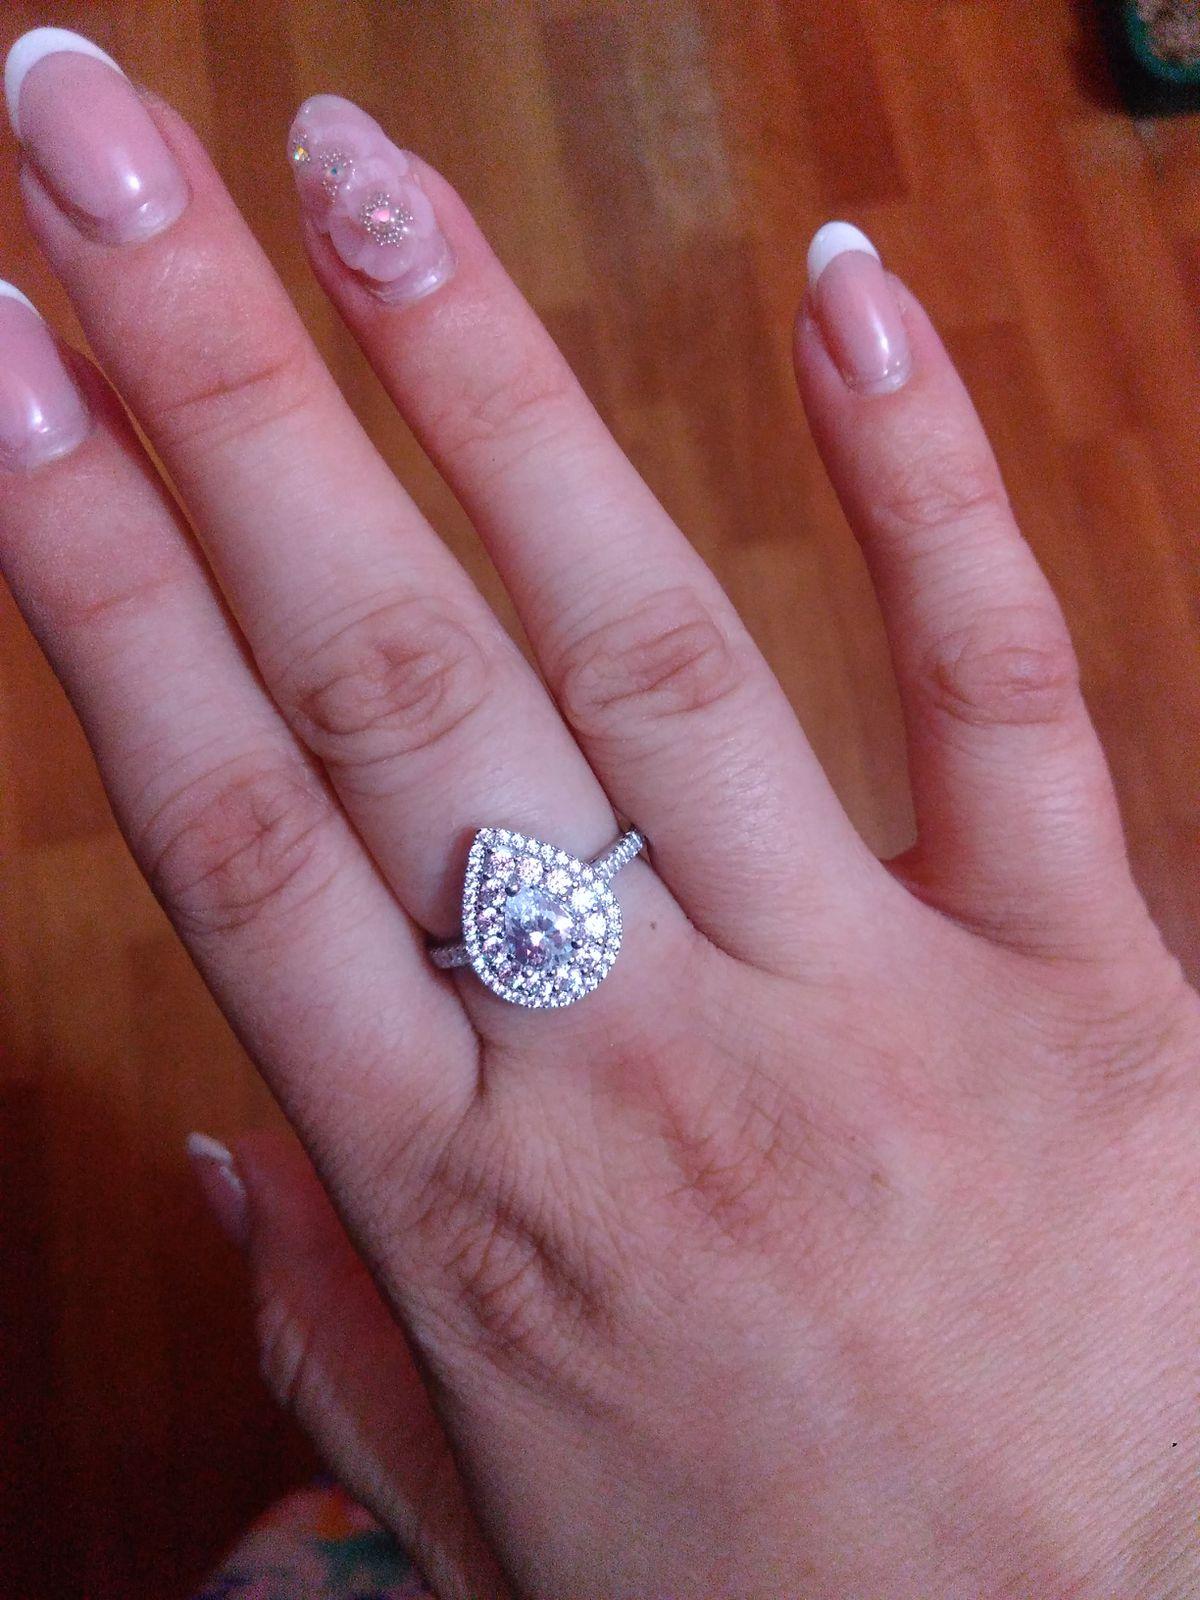 Шикарное кольцо!))